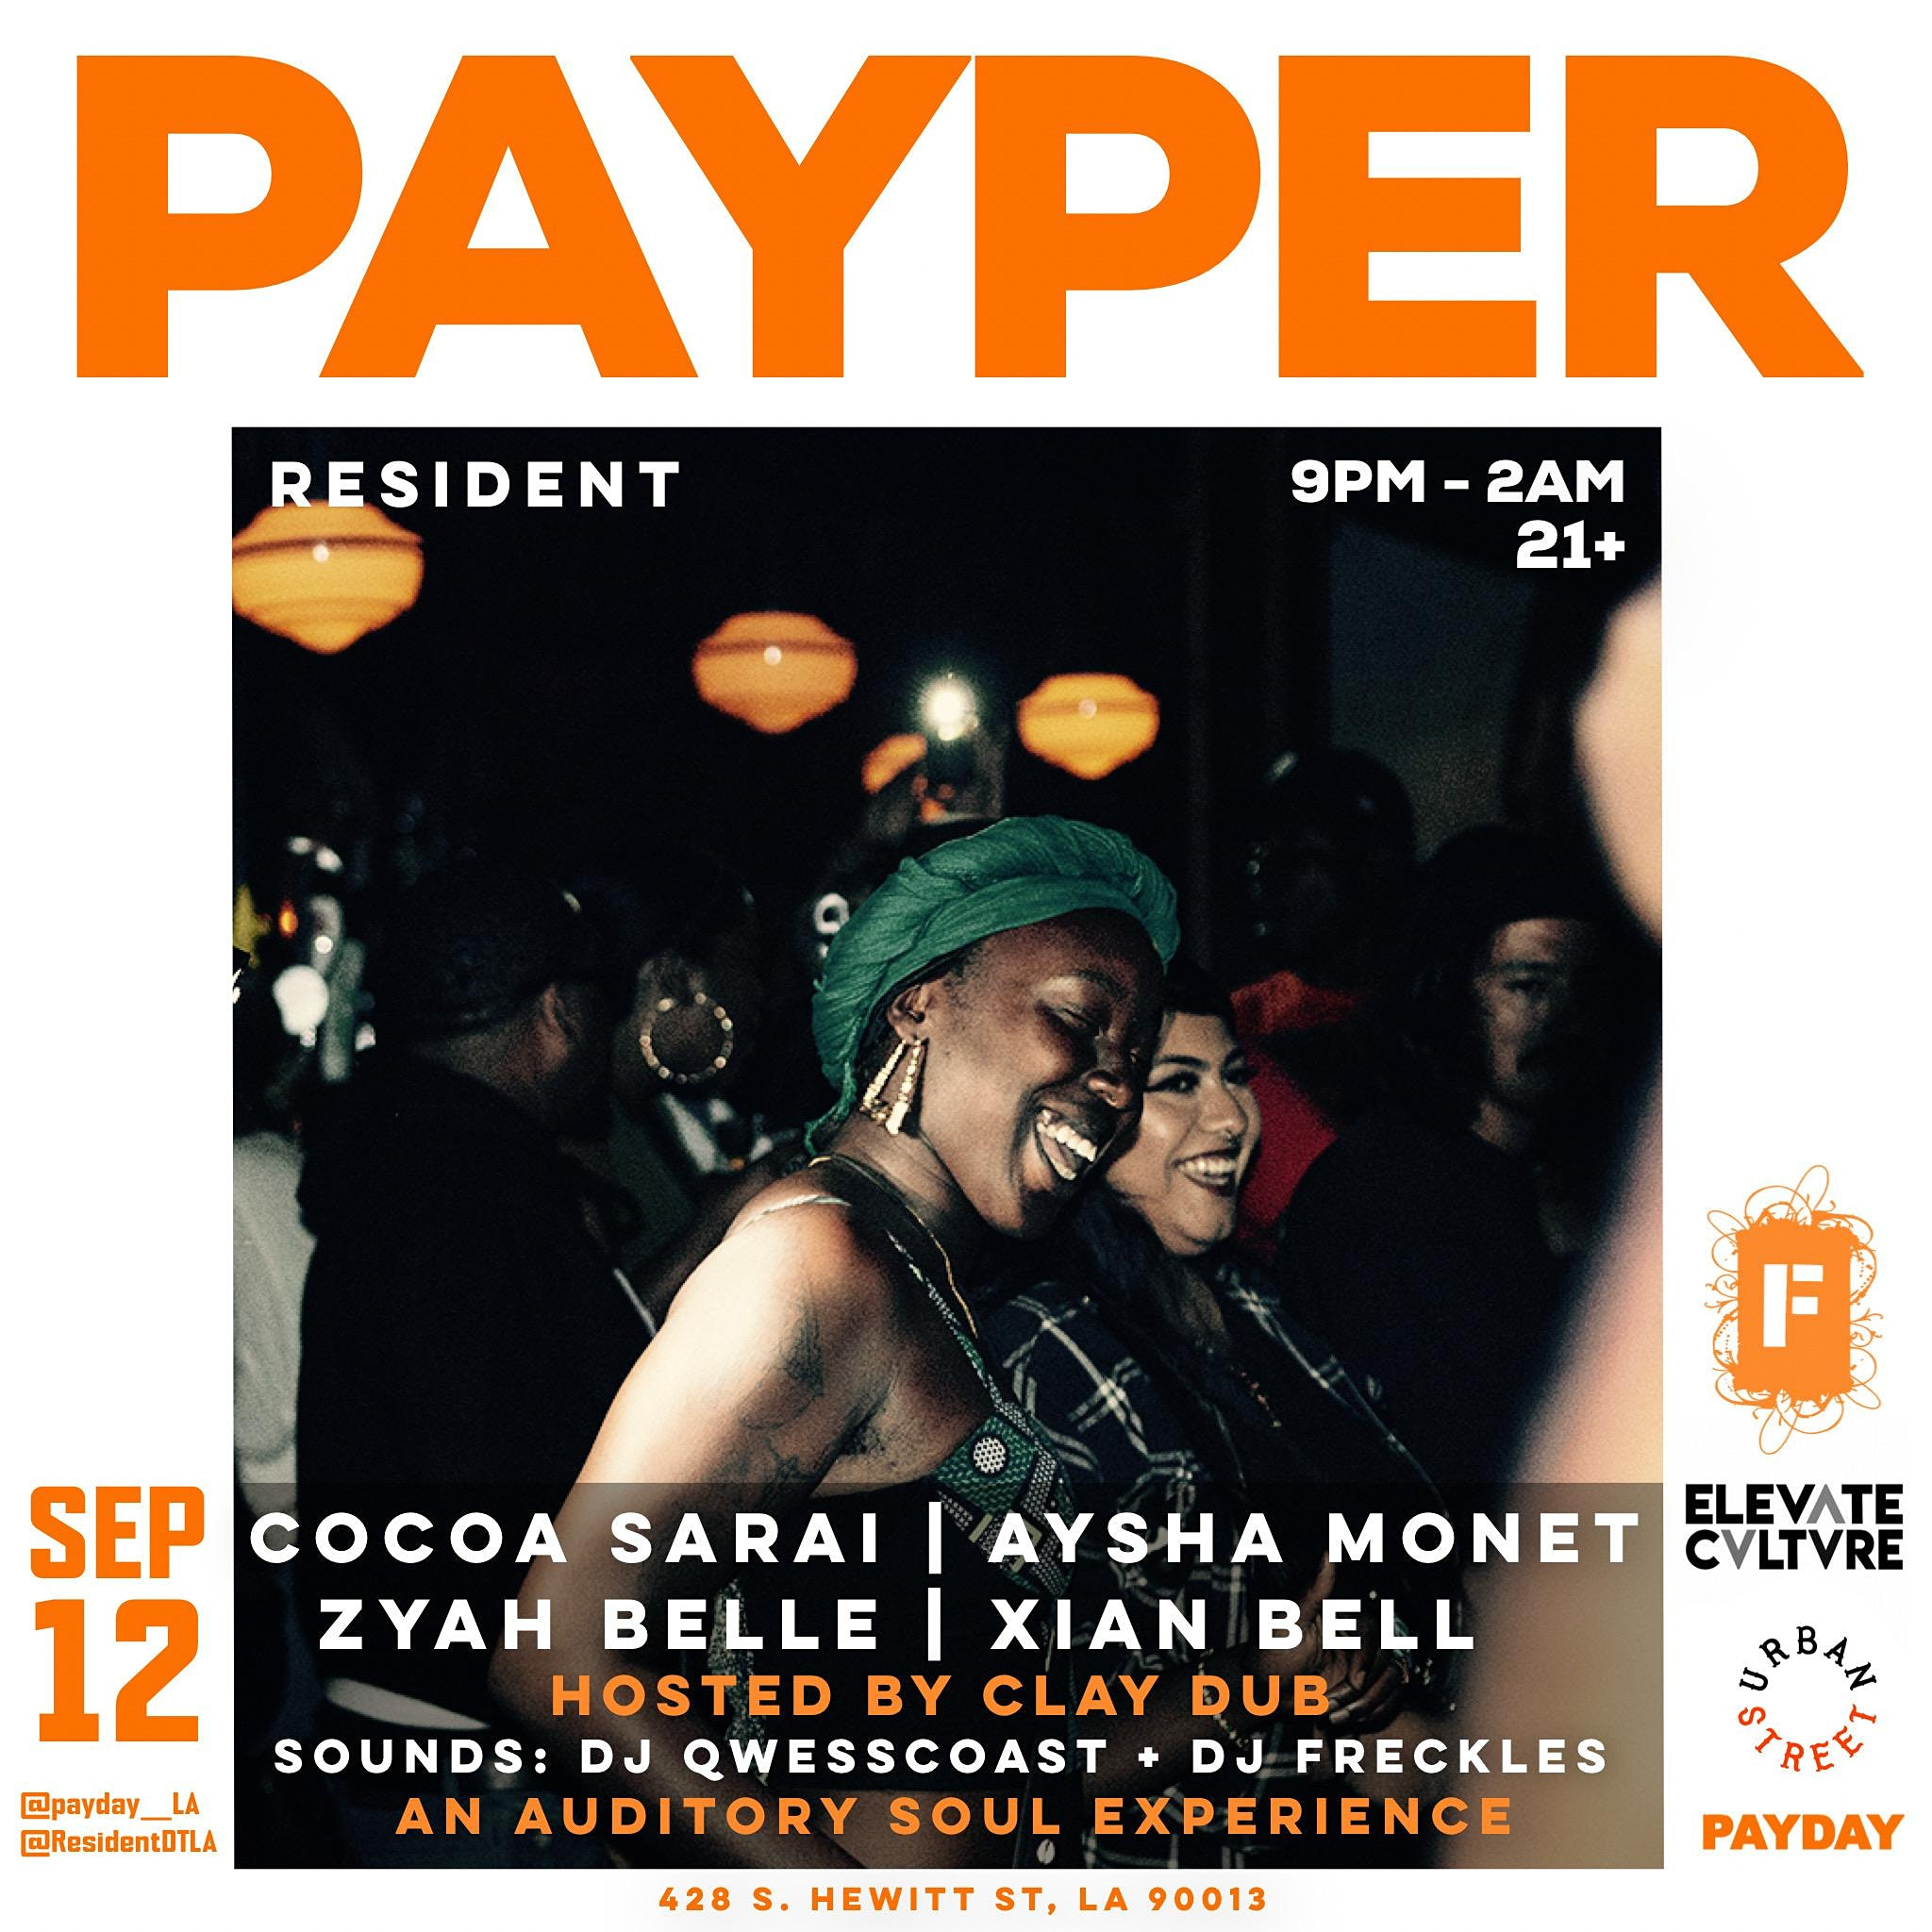 Elevate Culture & PayDay LA presents:  PAYPER